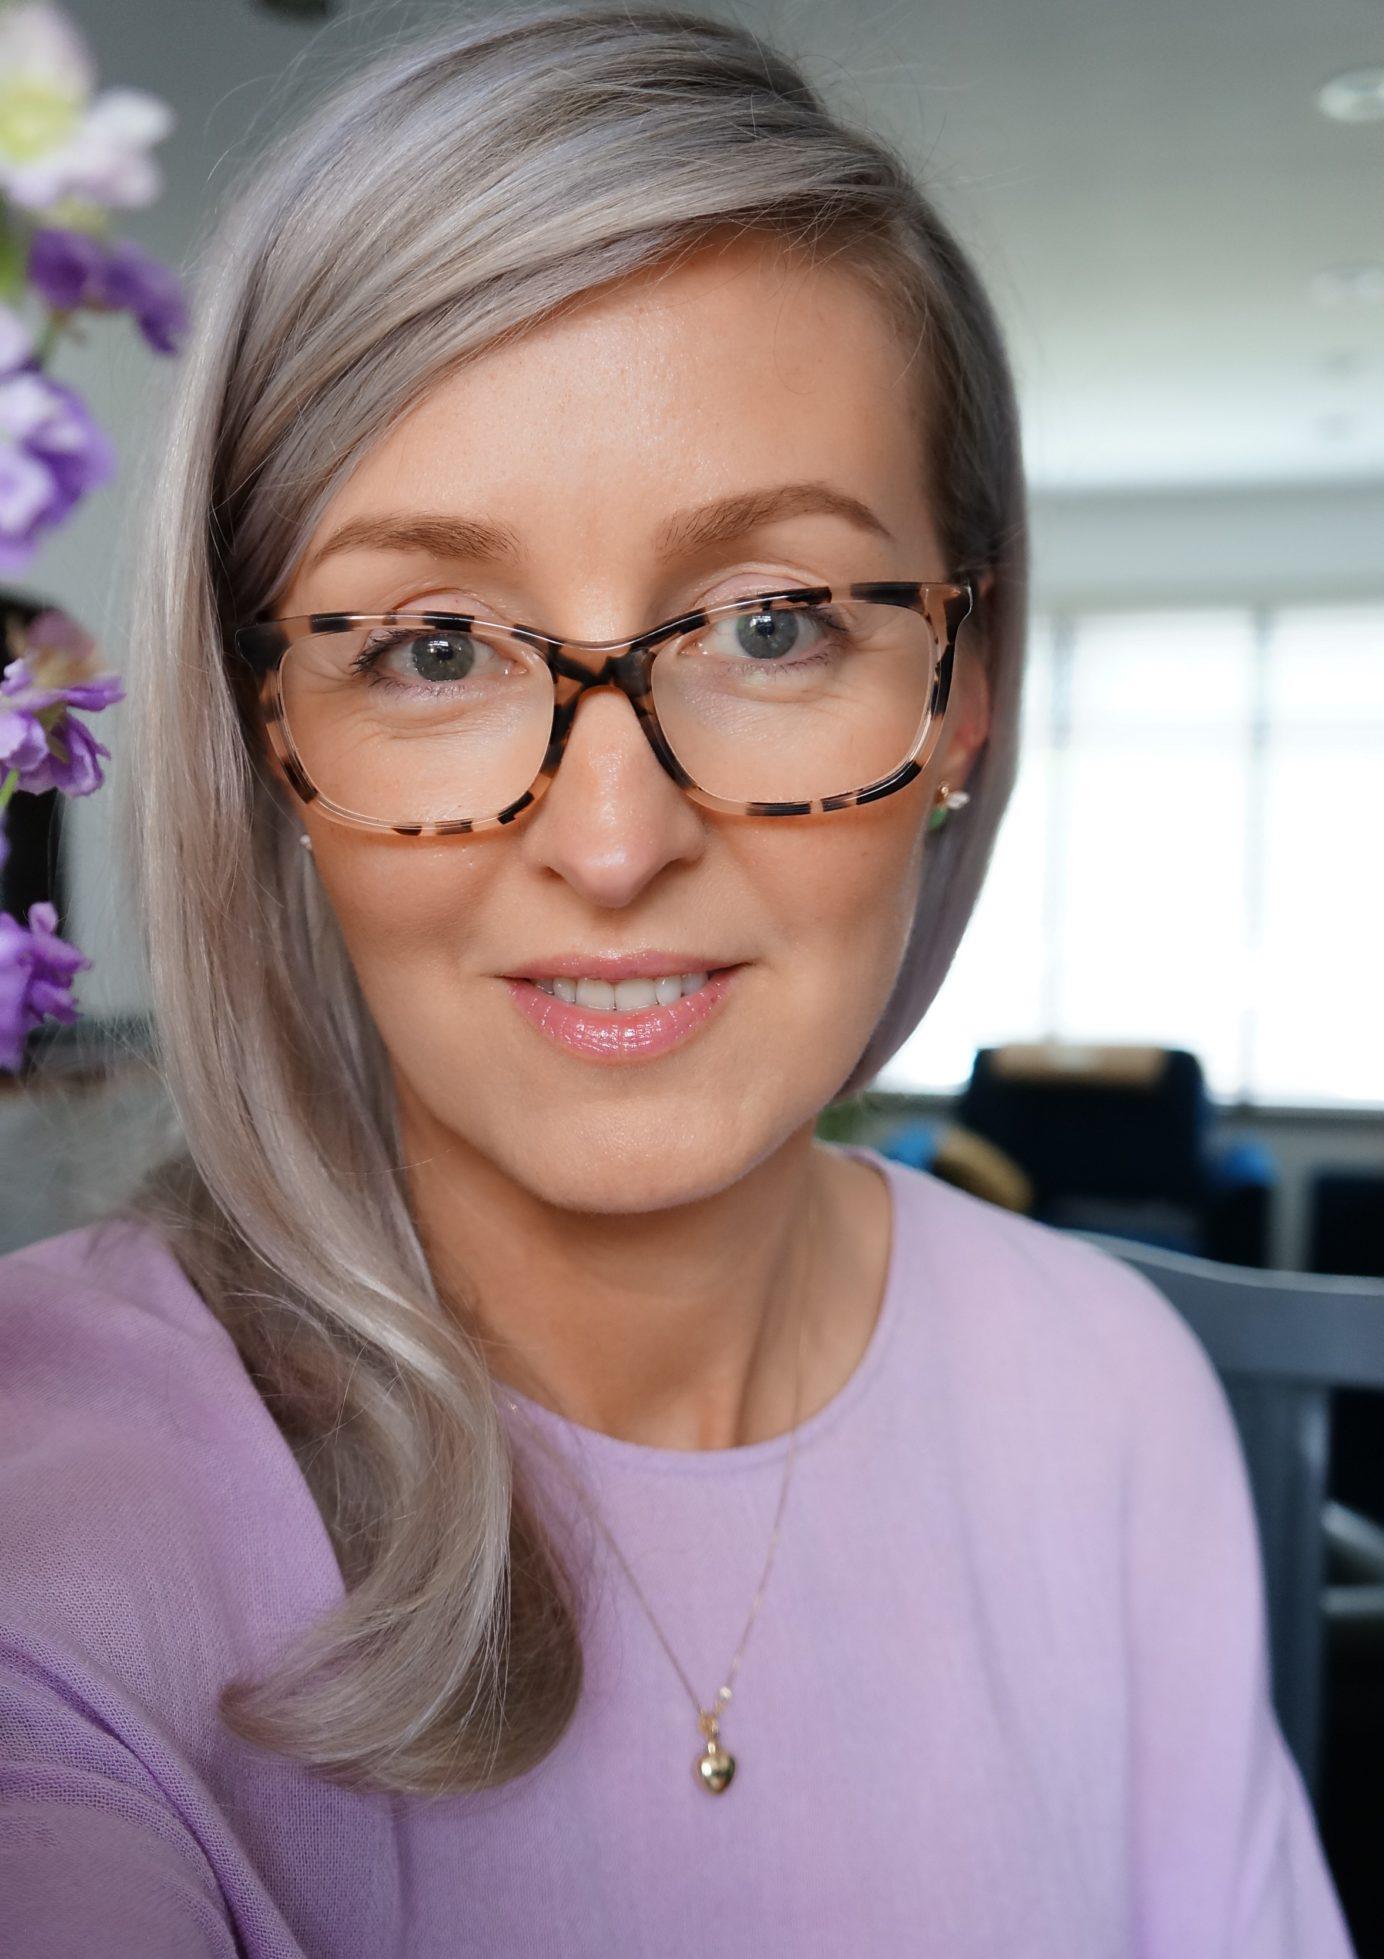 Alicja Fryc, Senior HSE Advisor